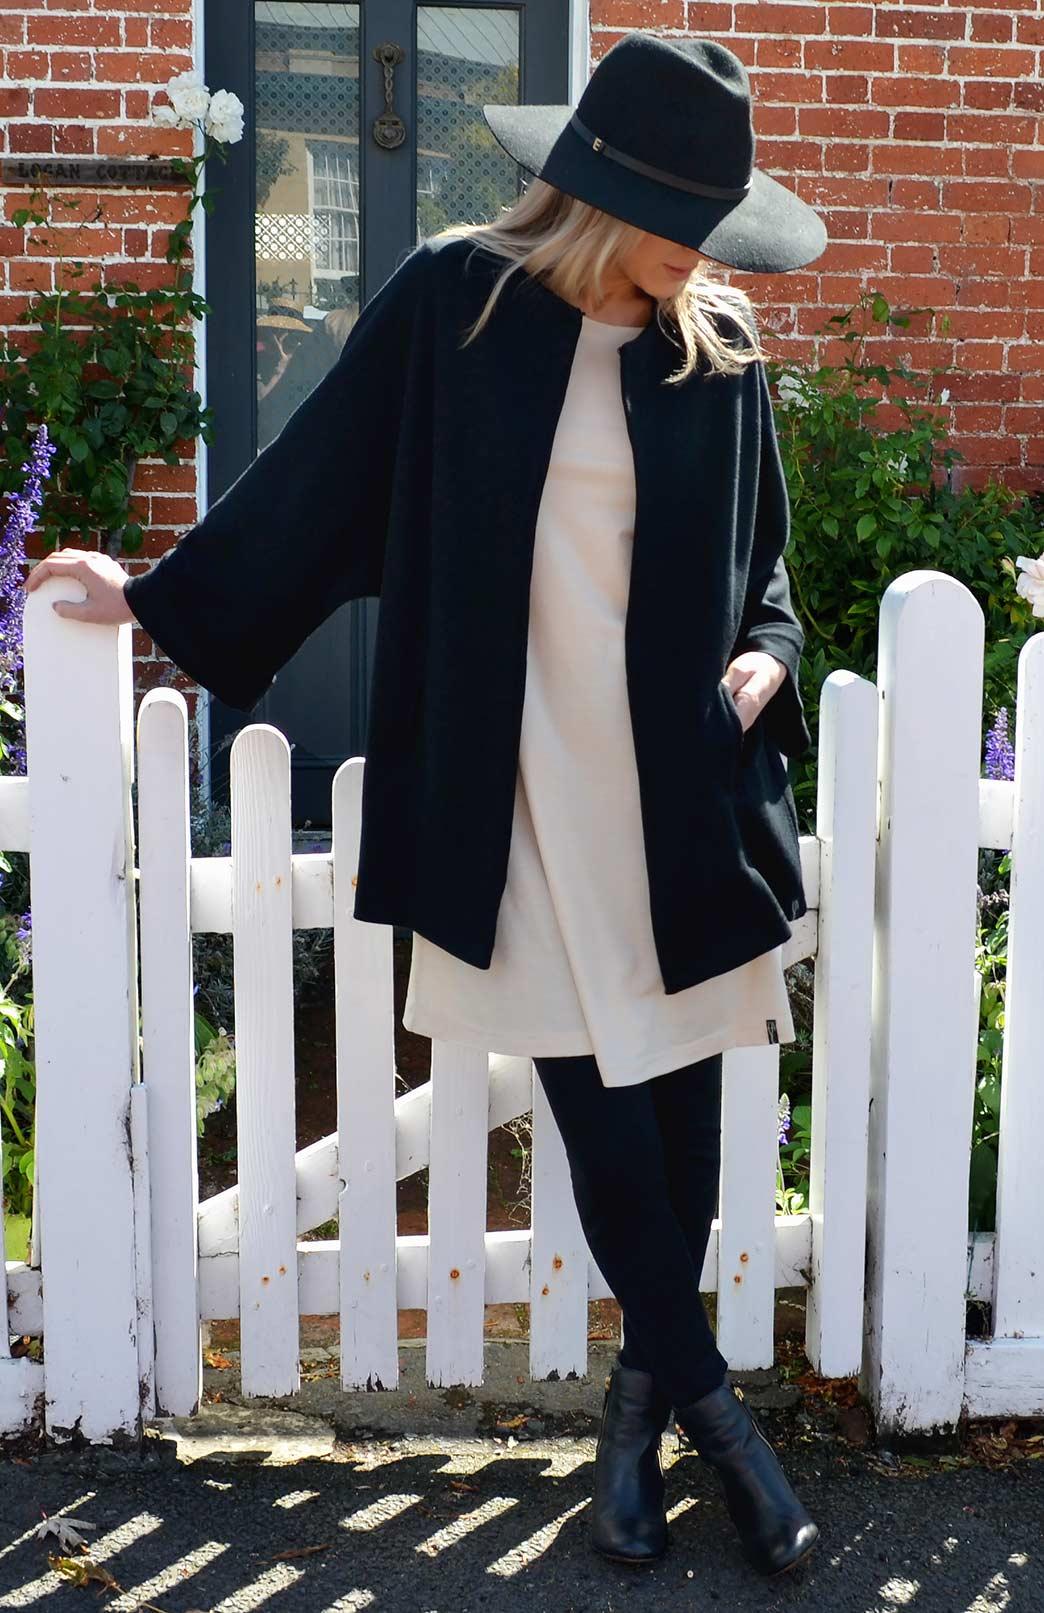 Kimono Coat - Women's Black Heavyweight Woollen Kimono Coat with hook and eye fastening and side pockets - Smitten Merino Tasmania Australia